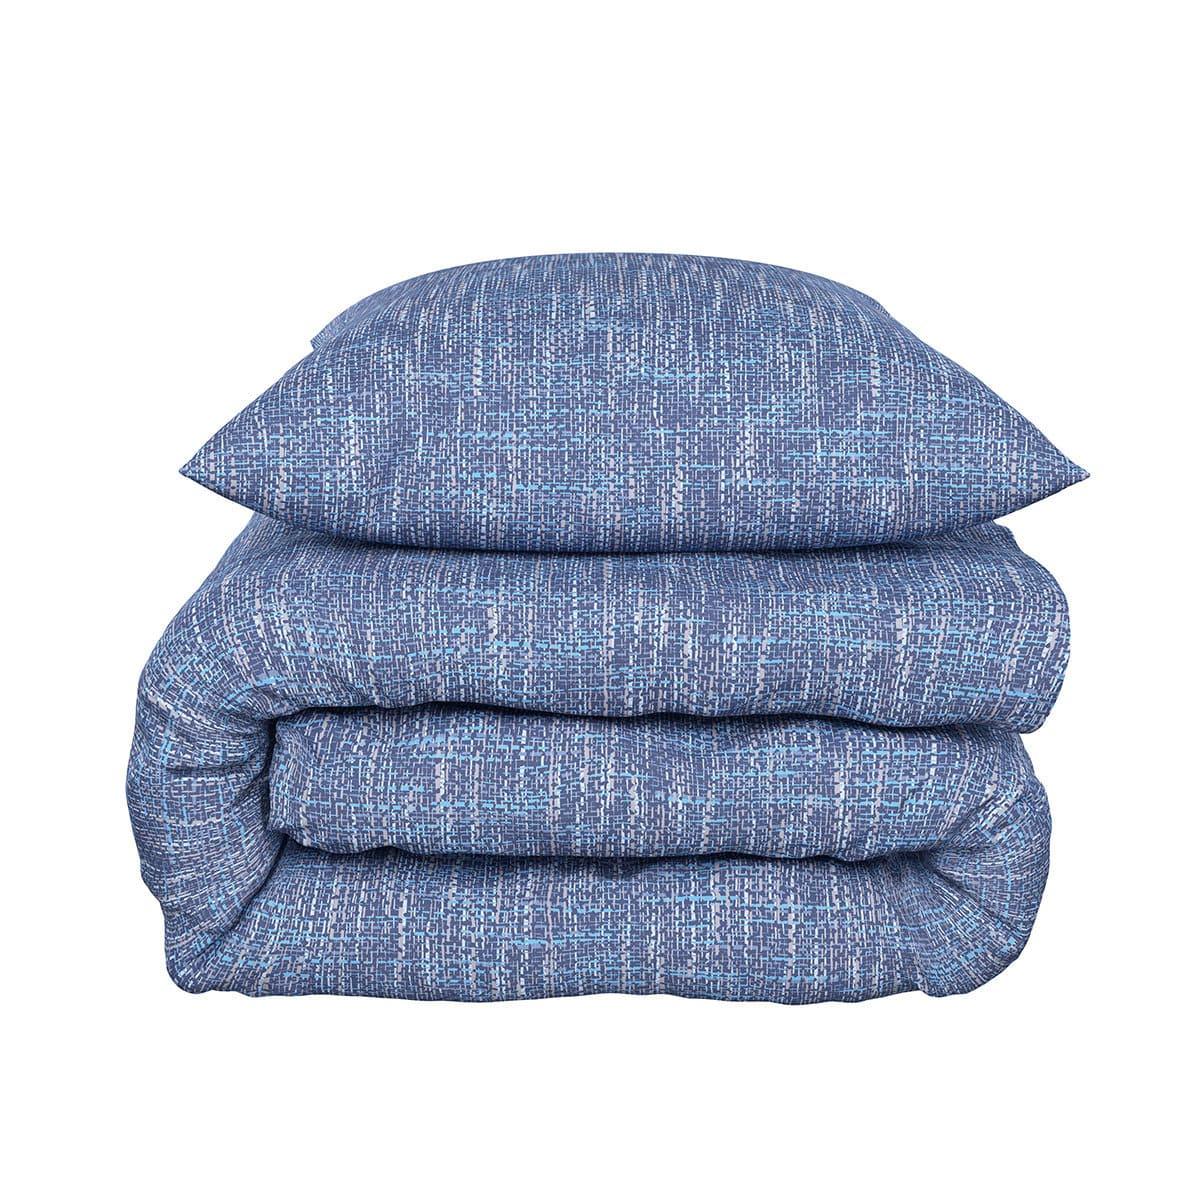 bettwarenshop bettw sche albi blau g nstig online kaufen bei bettwaren shop. Black Bedroom Furniture Sets. Home Design Ideas